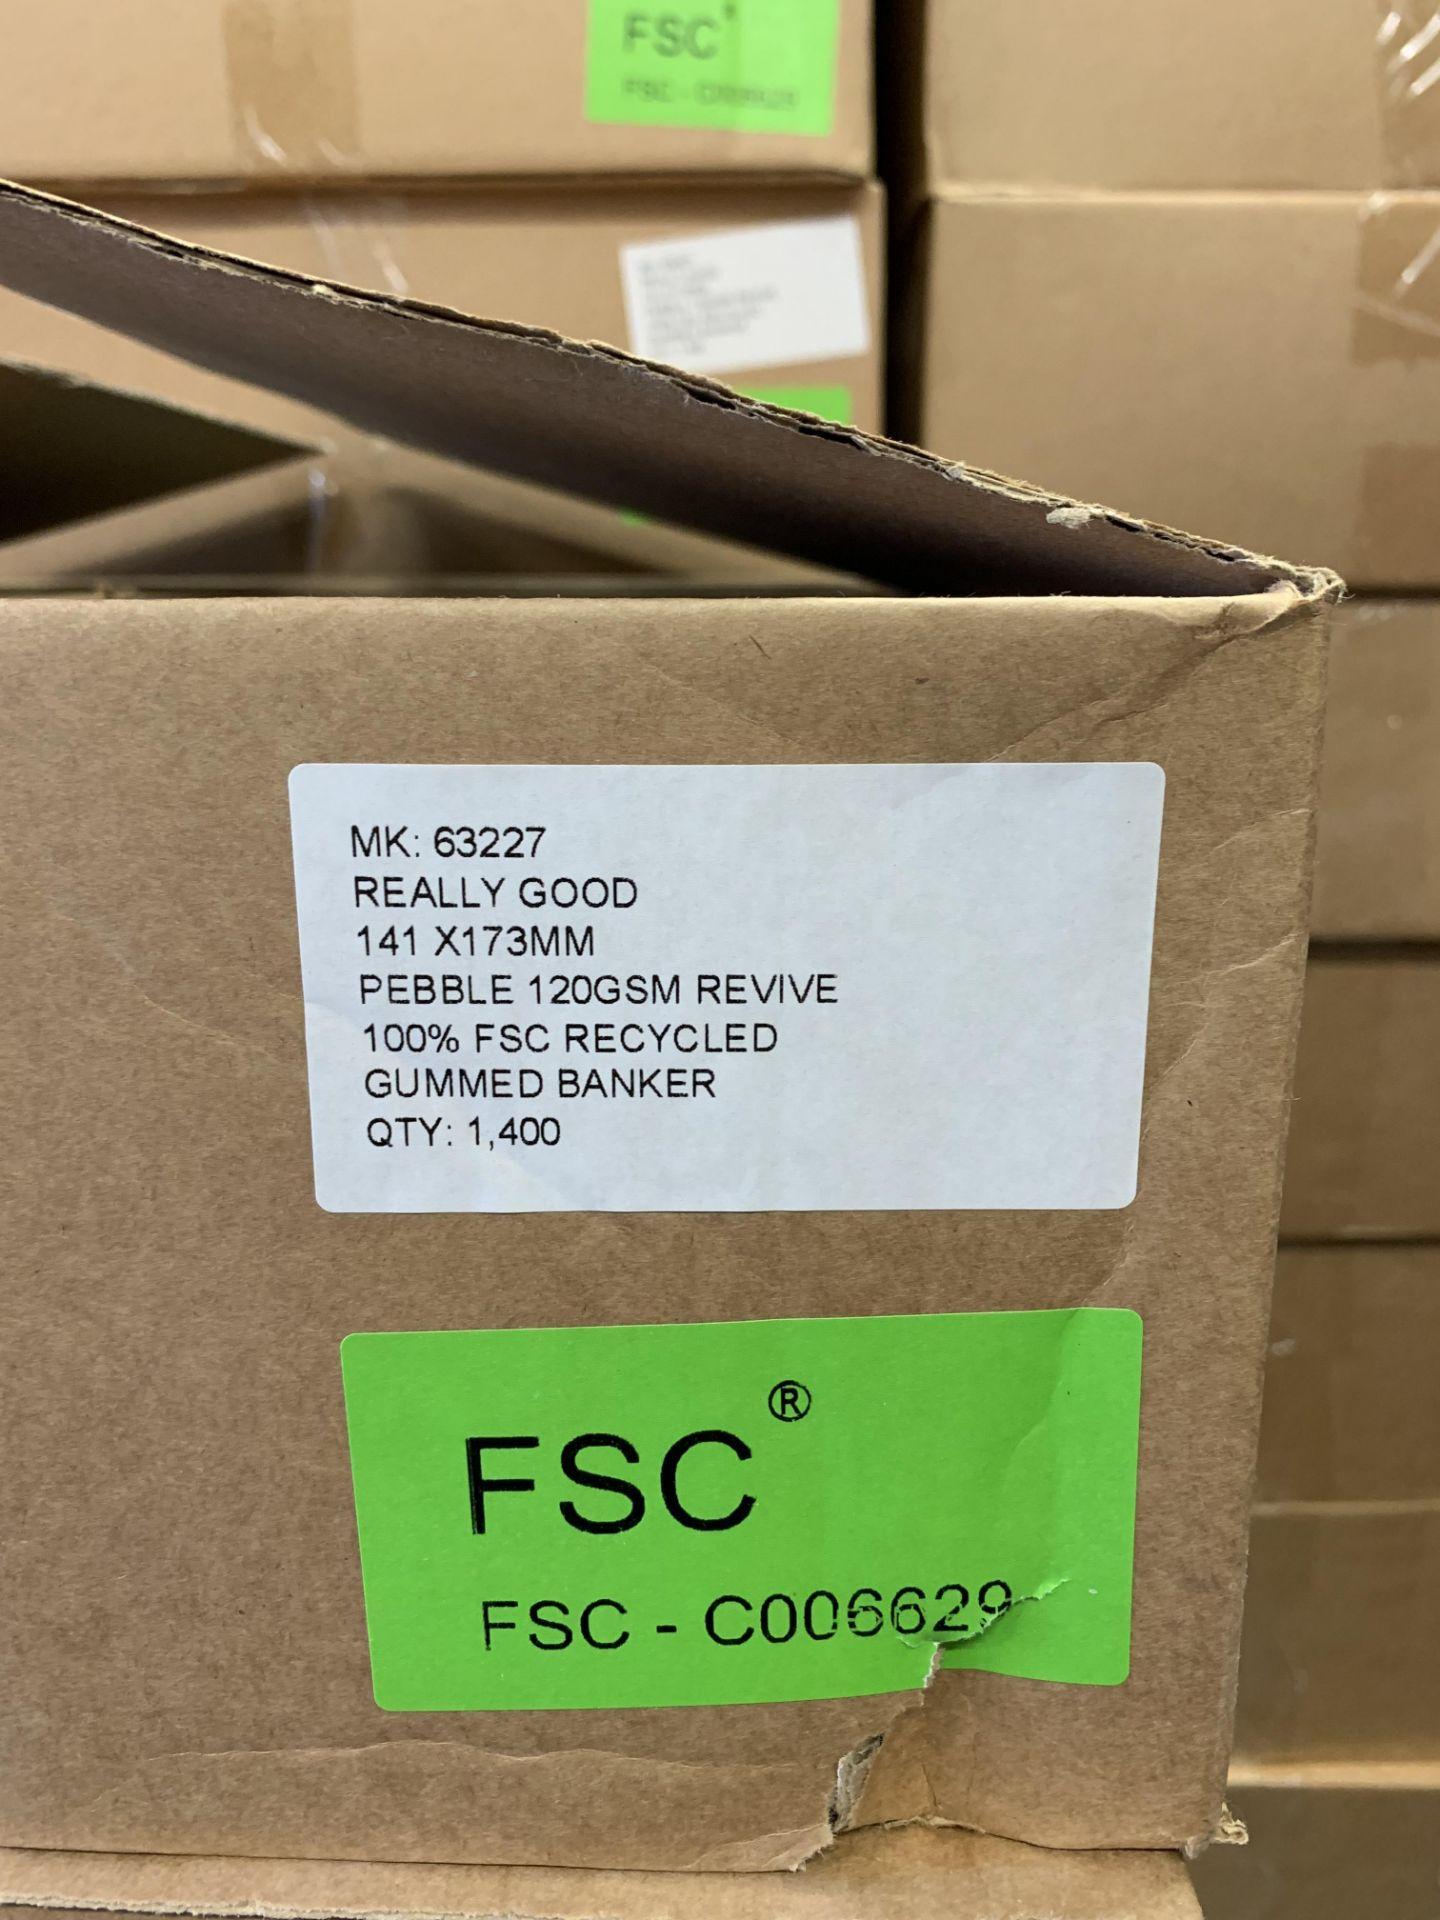 1400 Premium Pebble 120Sm Gu mmed Banker Envelopes 141 x 173 mm